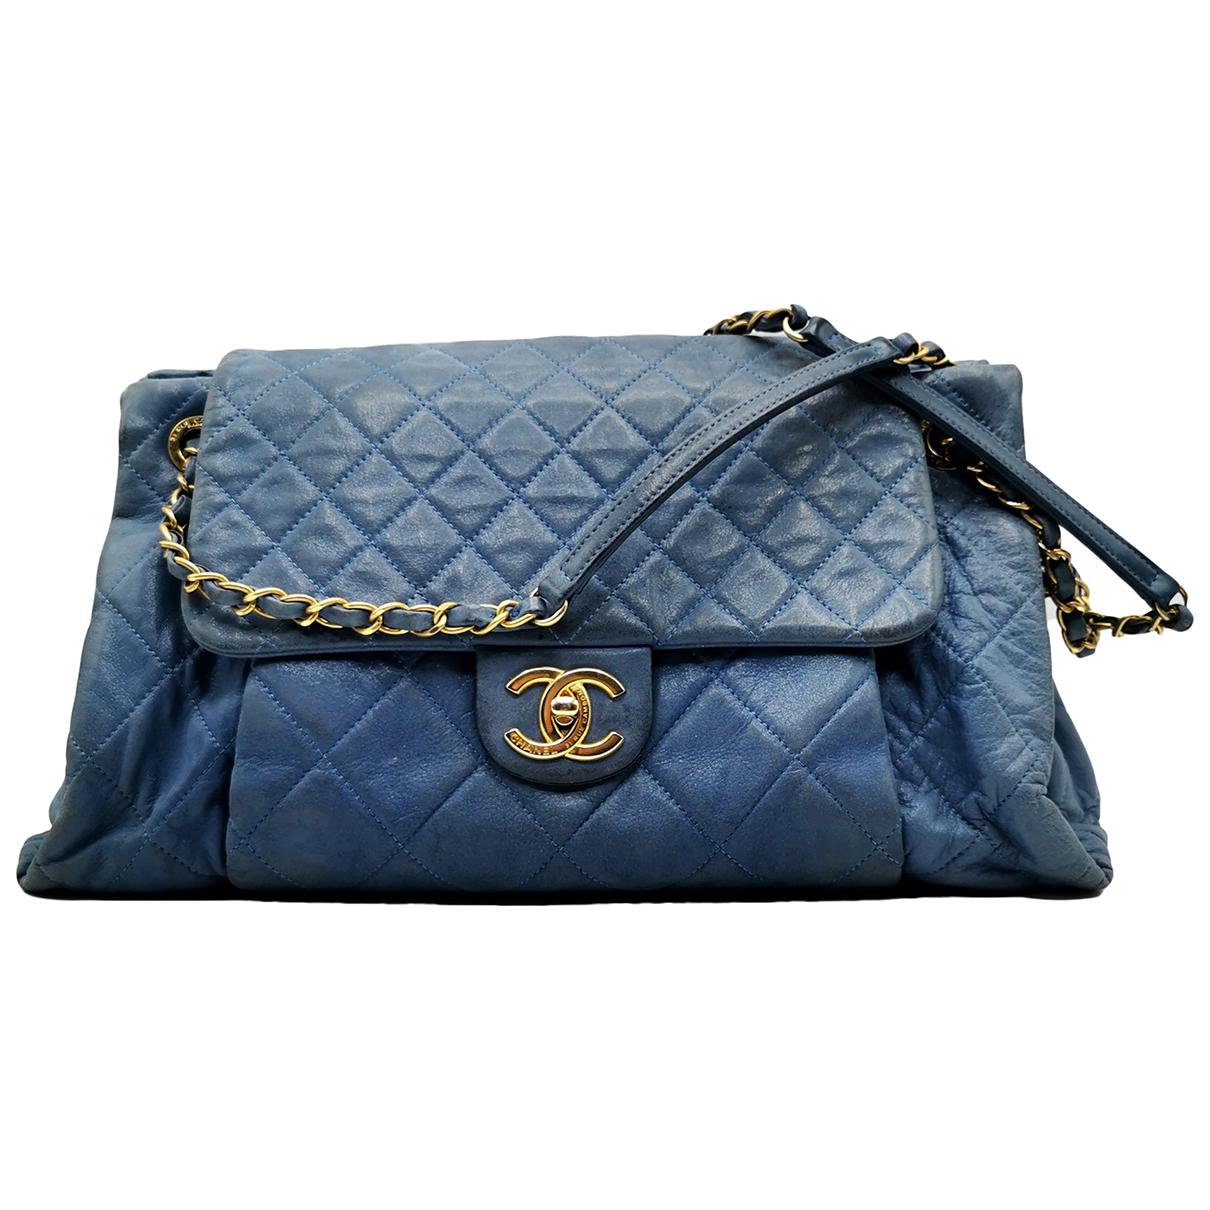 Chanel \N Blue Leather handbag for Women \N